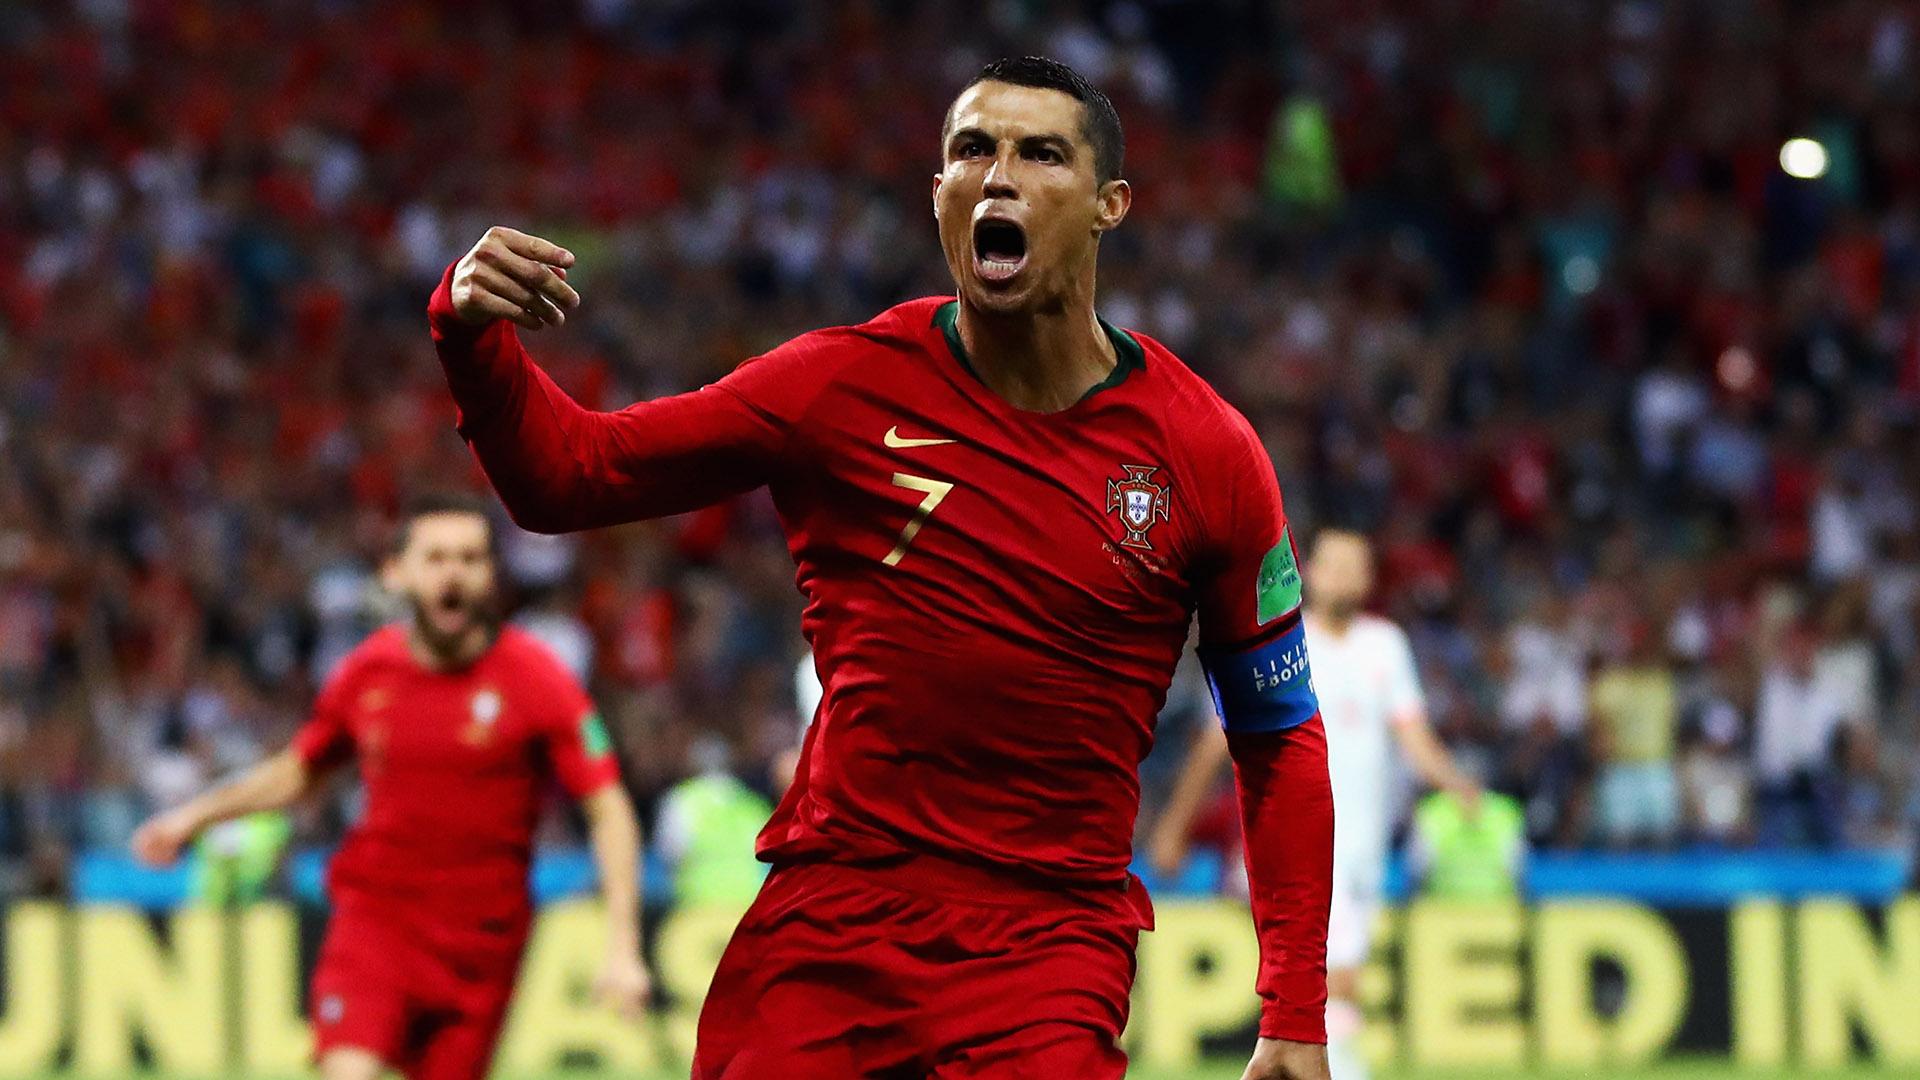 Cristiano Ronaldo Portugal Spain Messi and Ronaldo